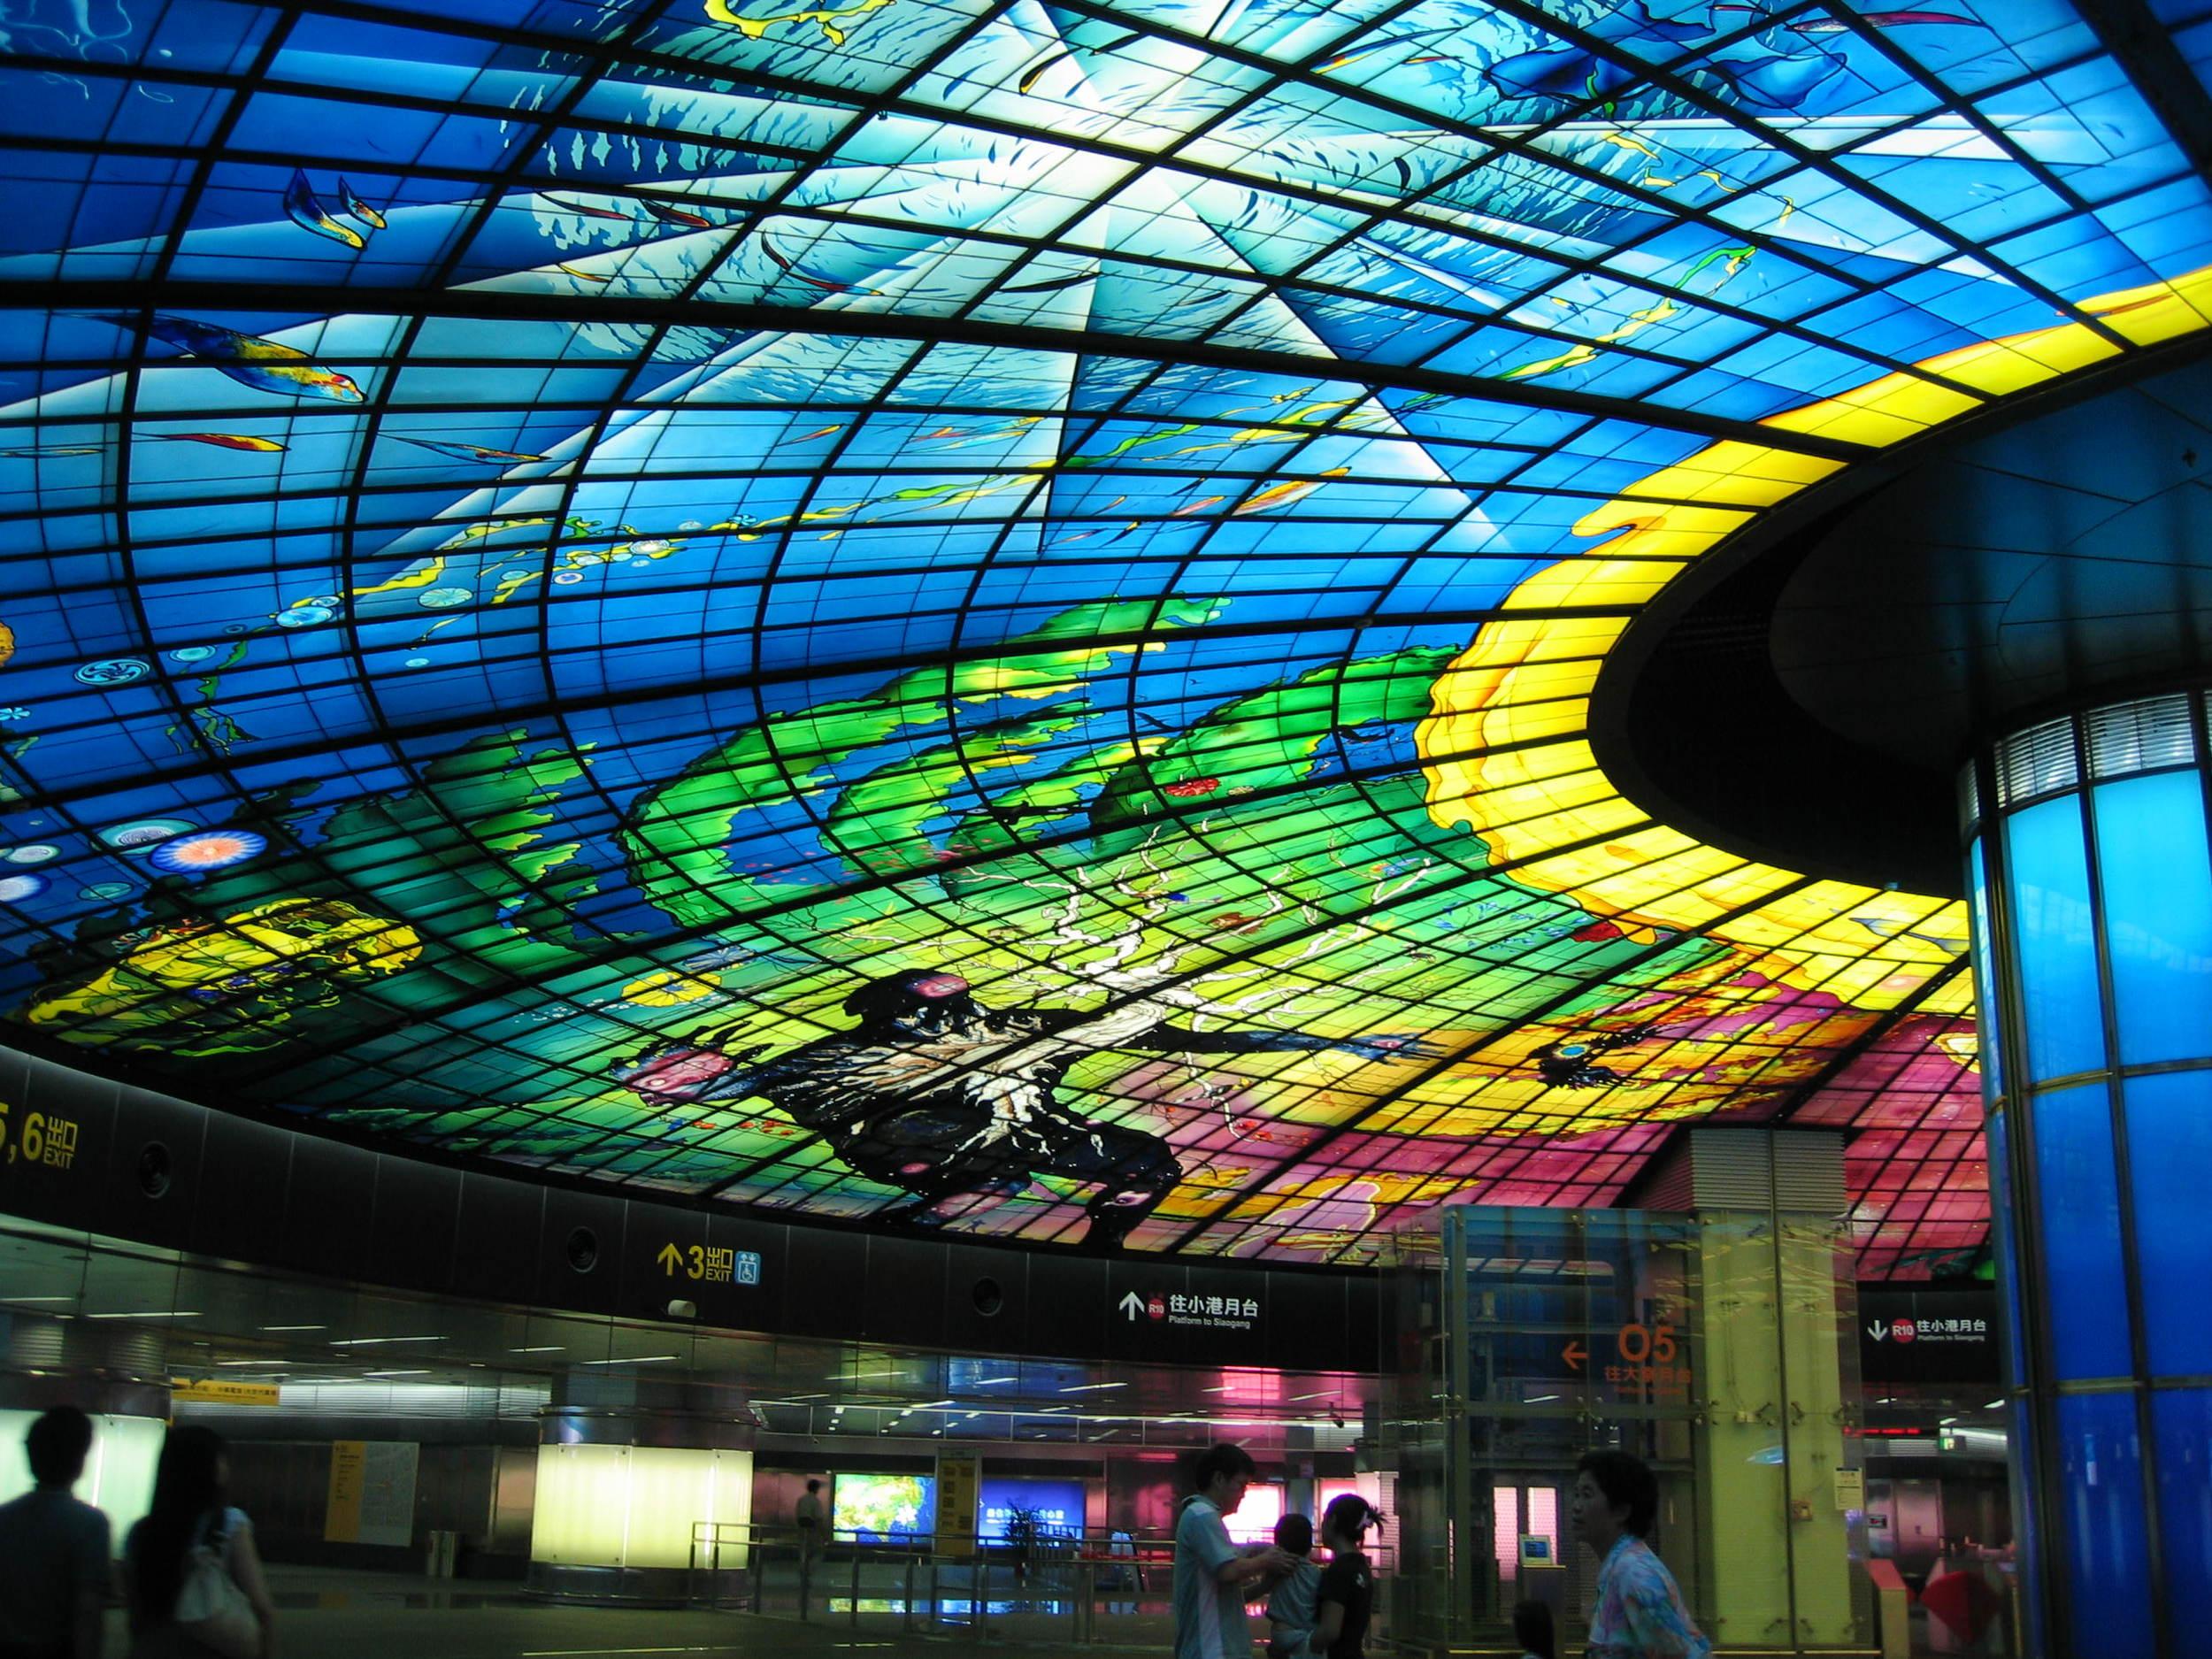 Subway ceiling